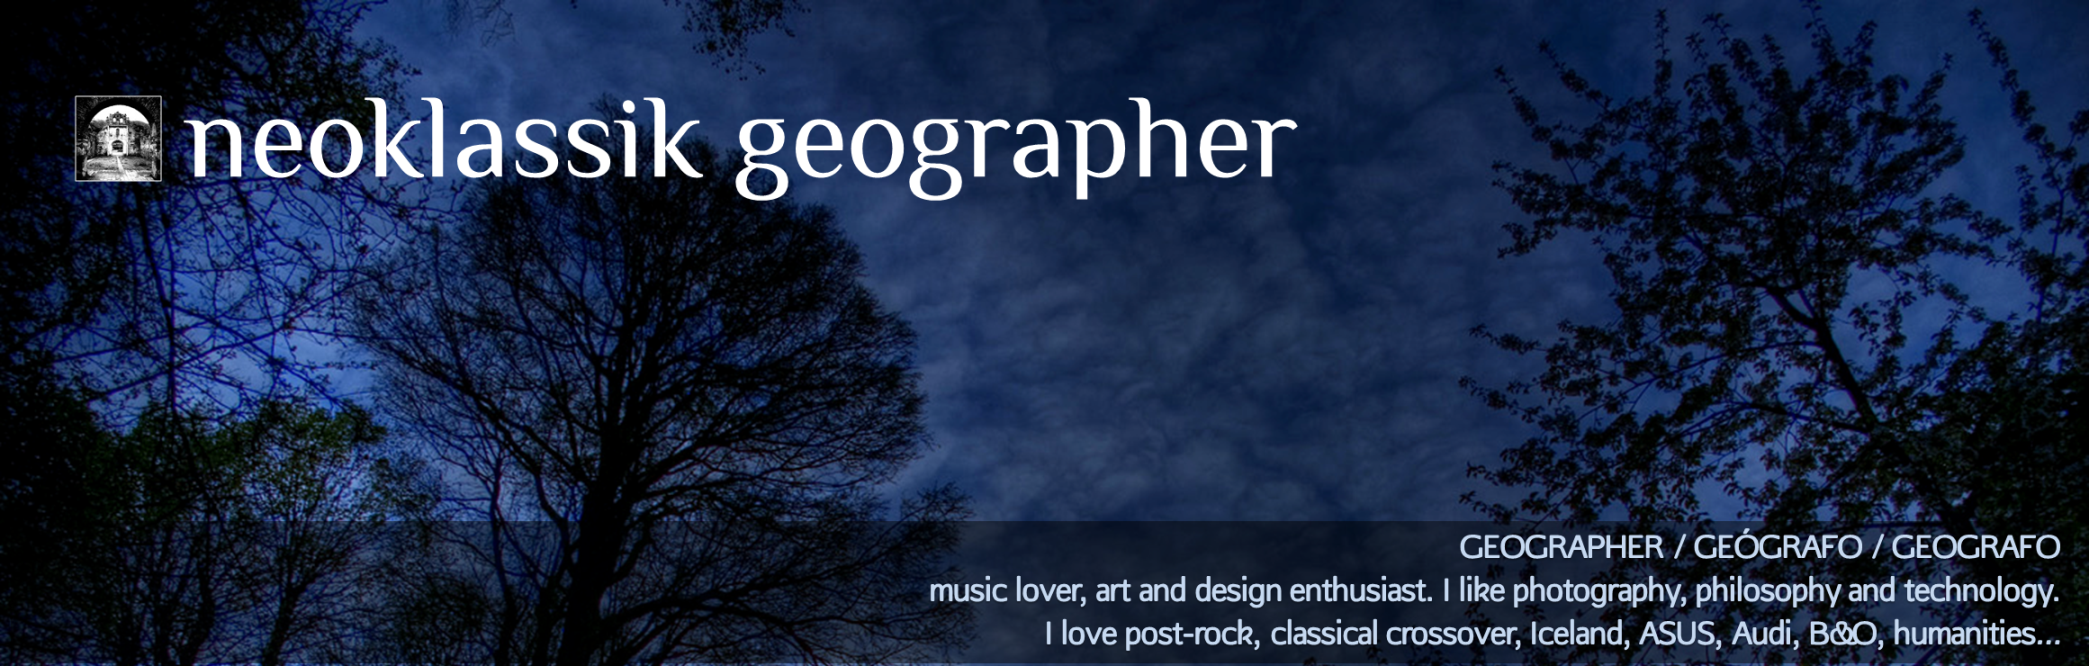 neoklassik geographer